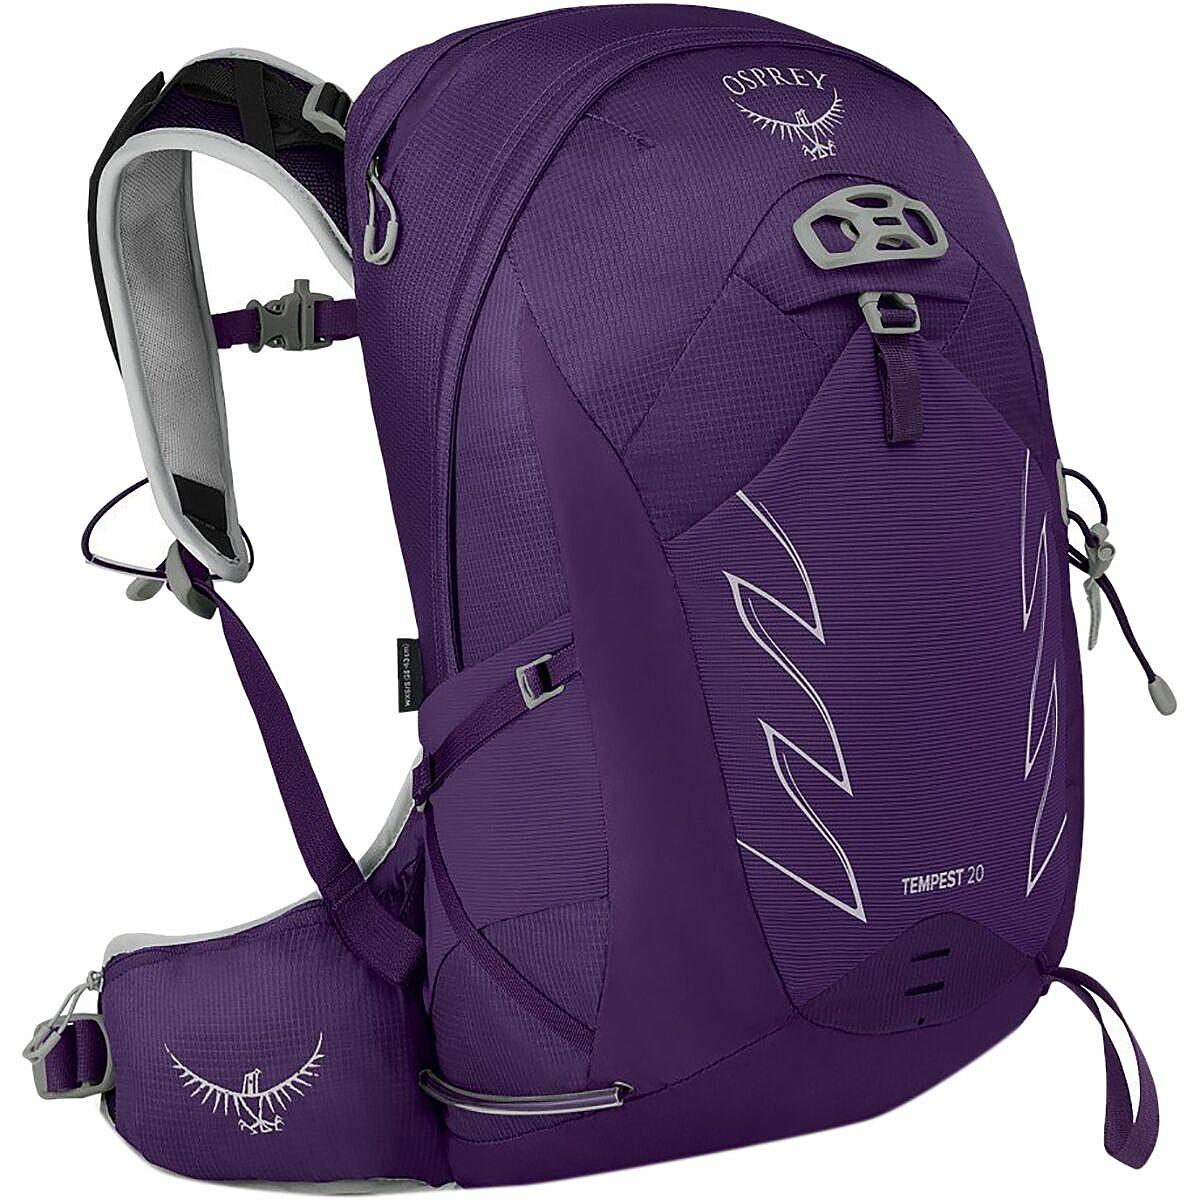 batoh Osprey Tempest 20 XS/S - Violac Purple 18 L